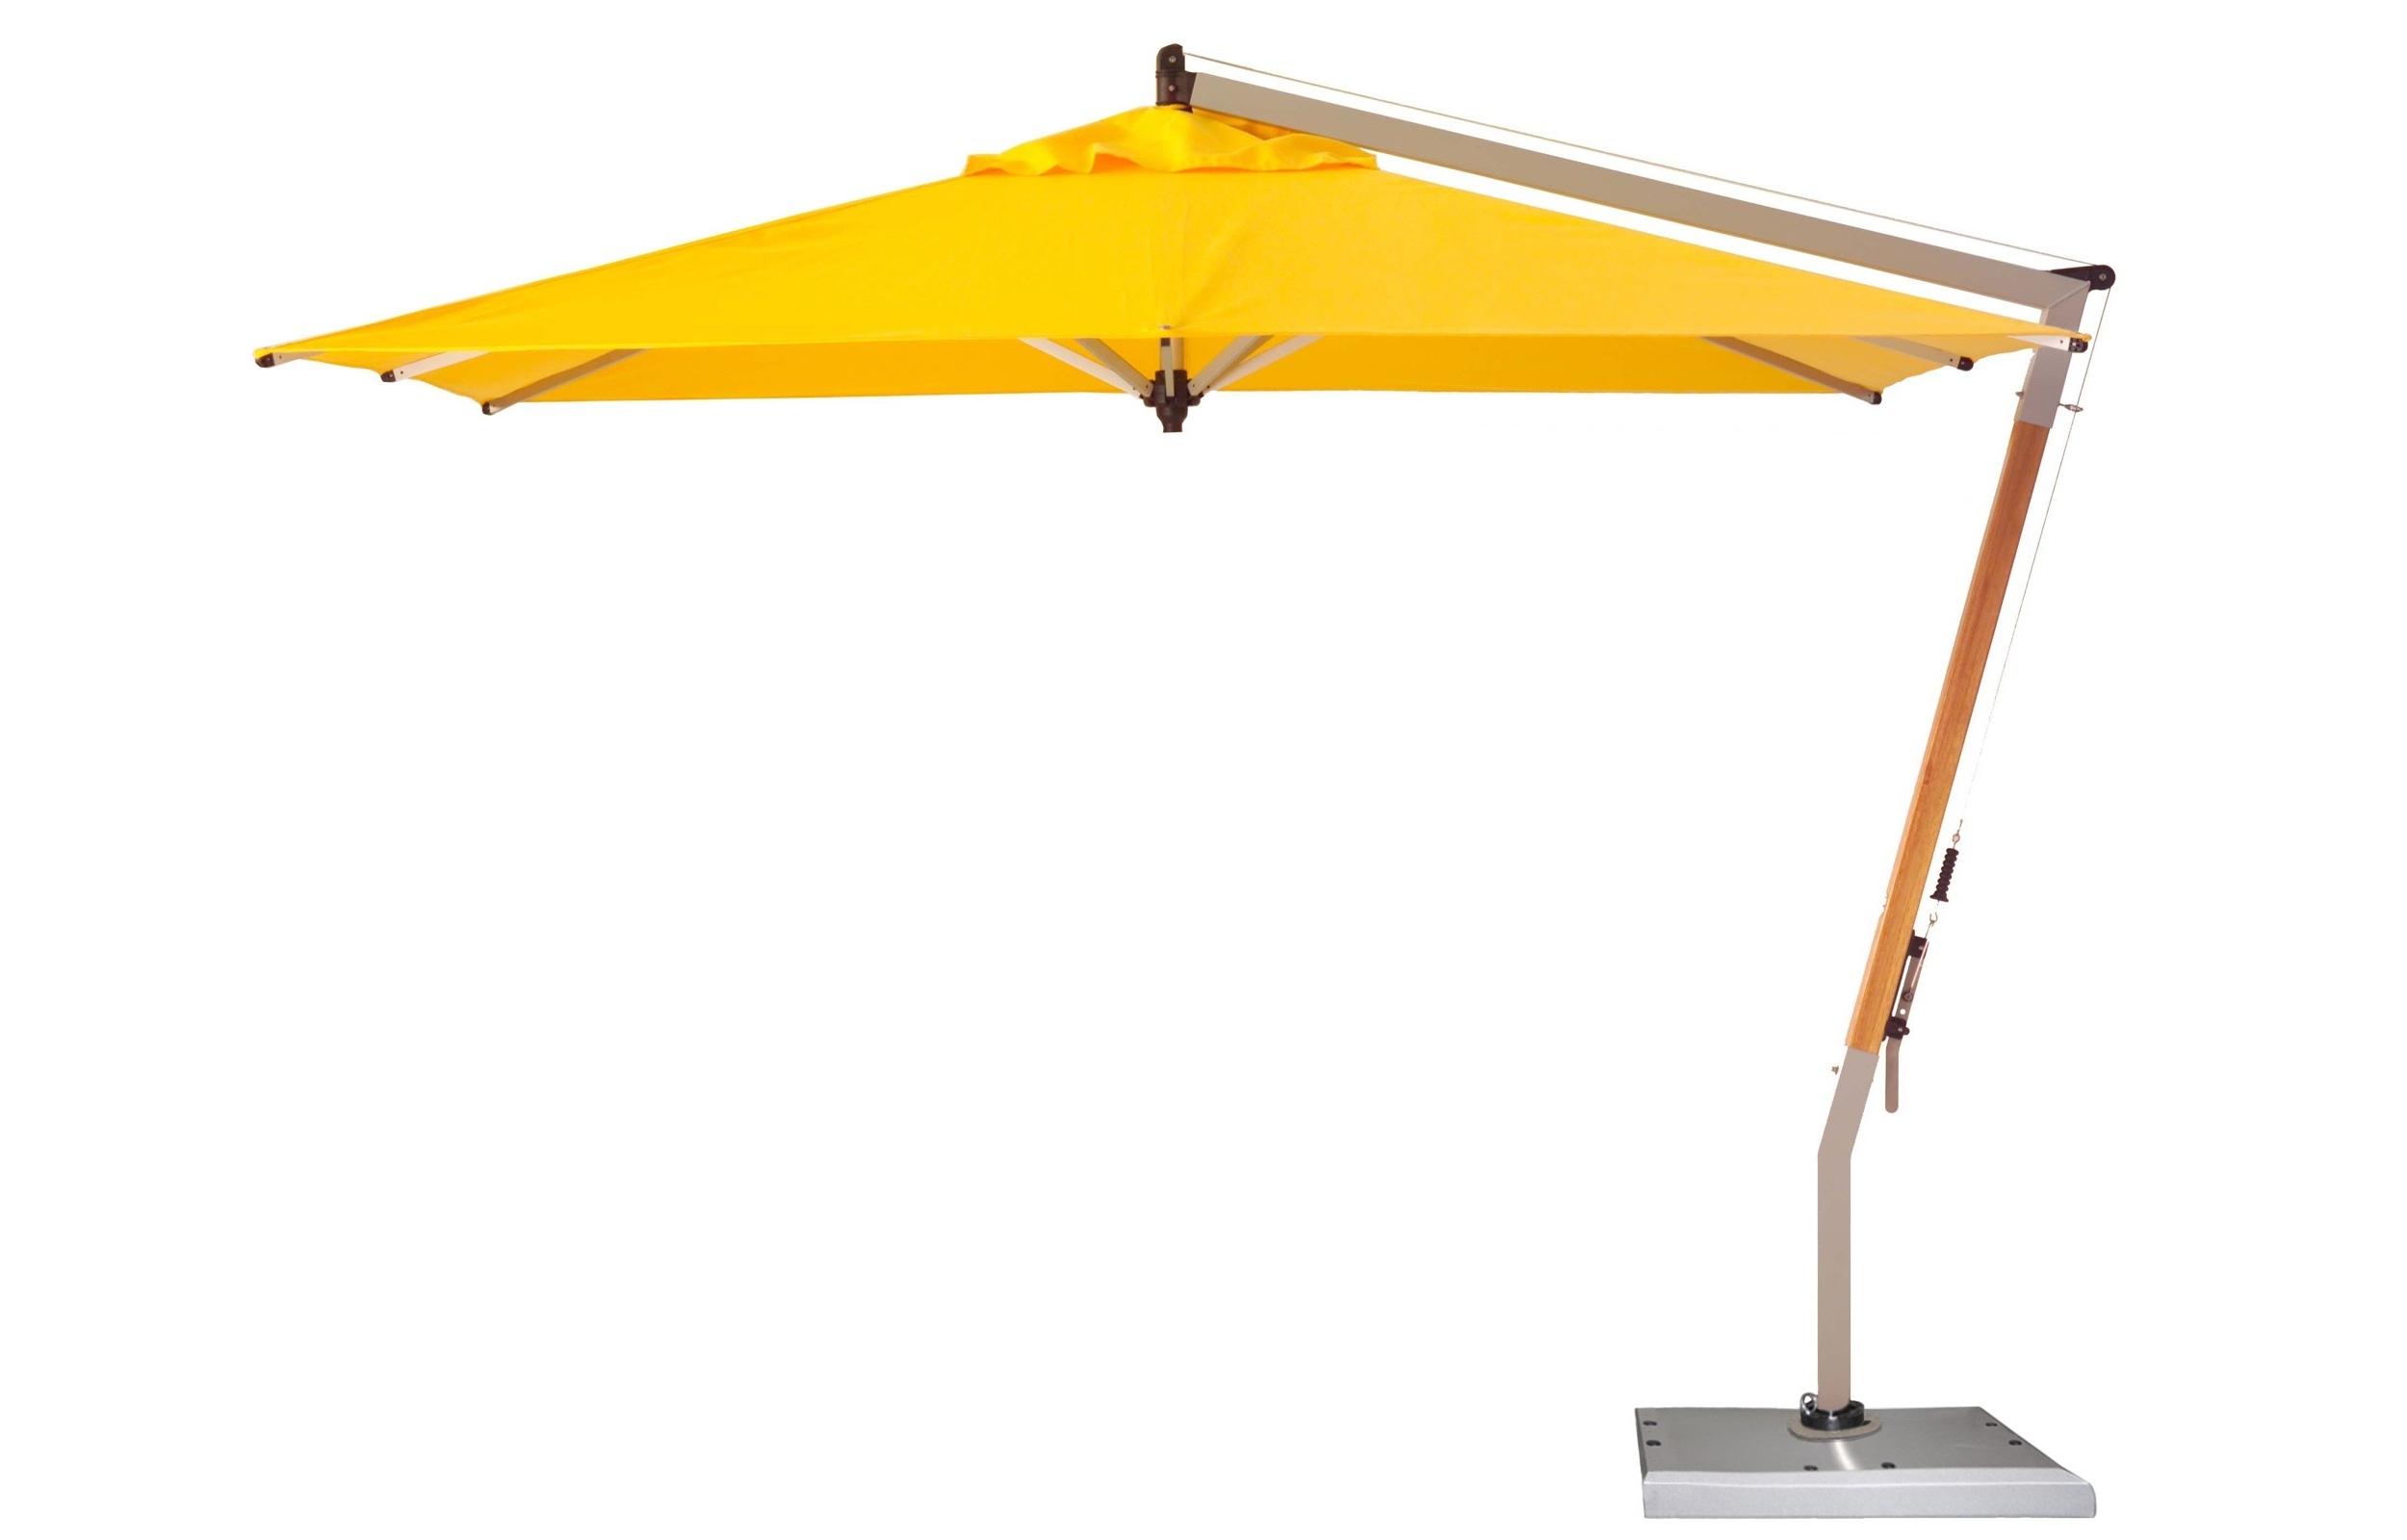 Plush Cantilever Patio Umbrella Cantilever Patio Umbrella Ravenna To Intended For Latest Yellow Patio Umbrellas (View 7 of 20)